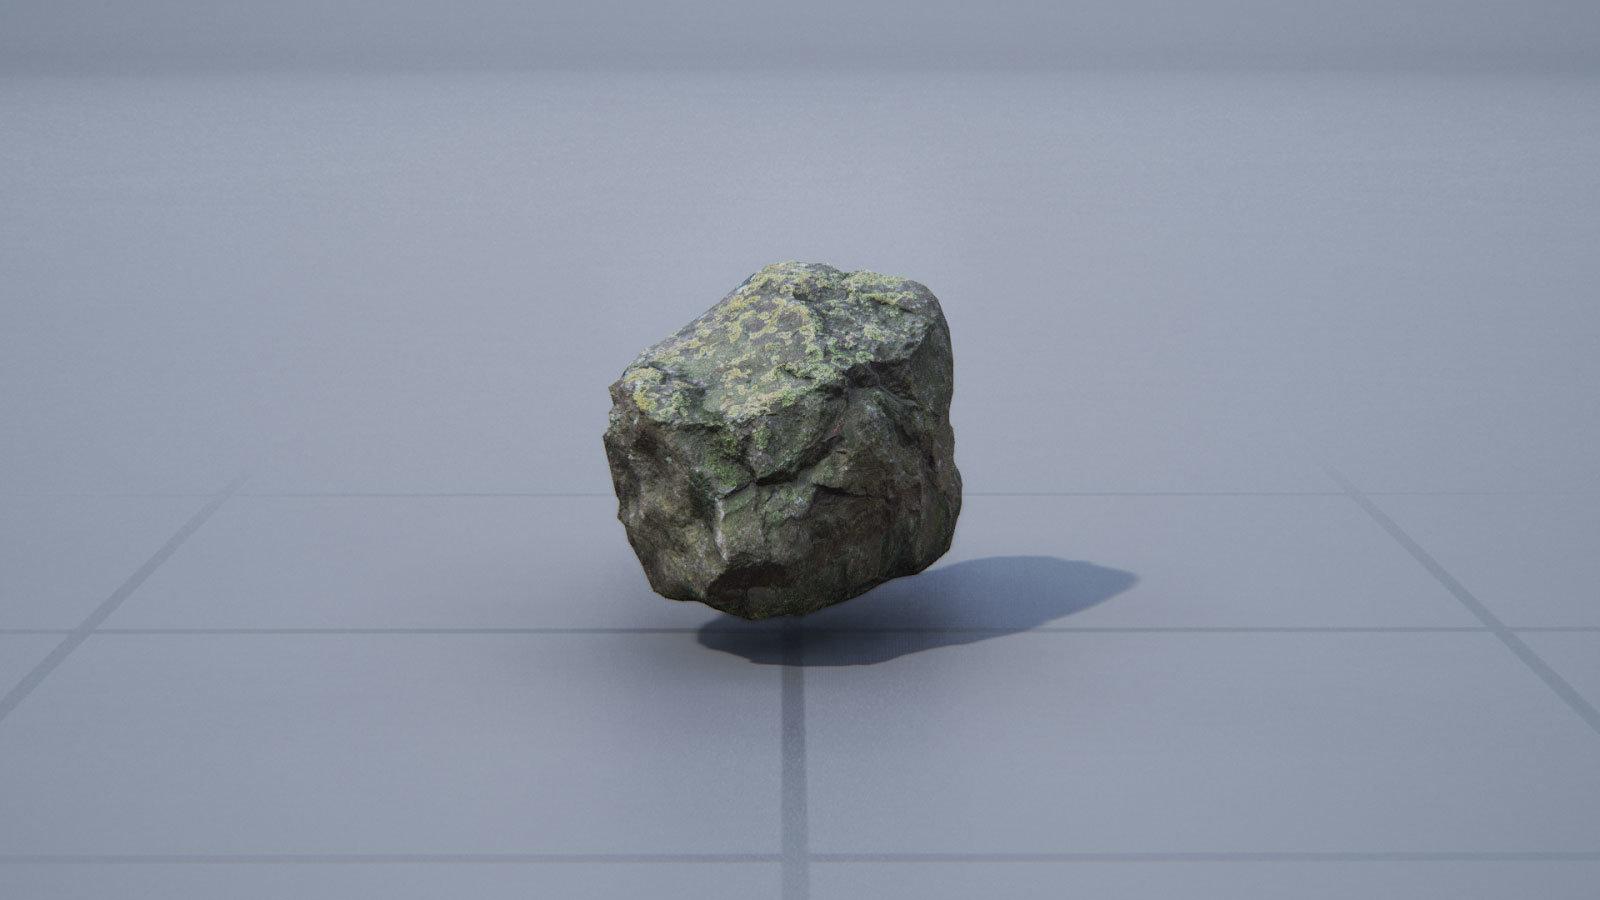 Fertiges Modell eines Felsens